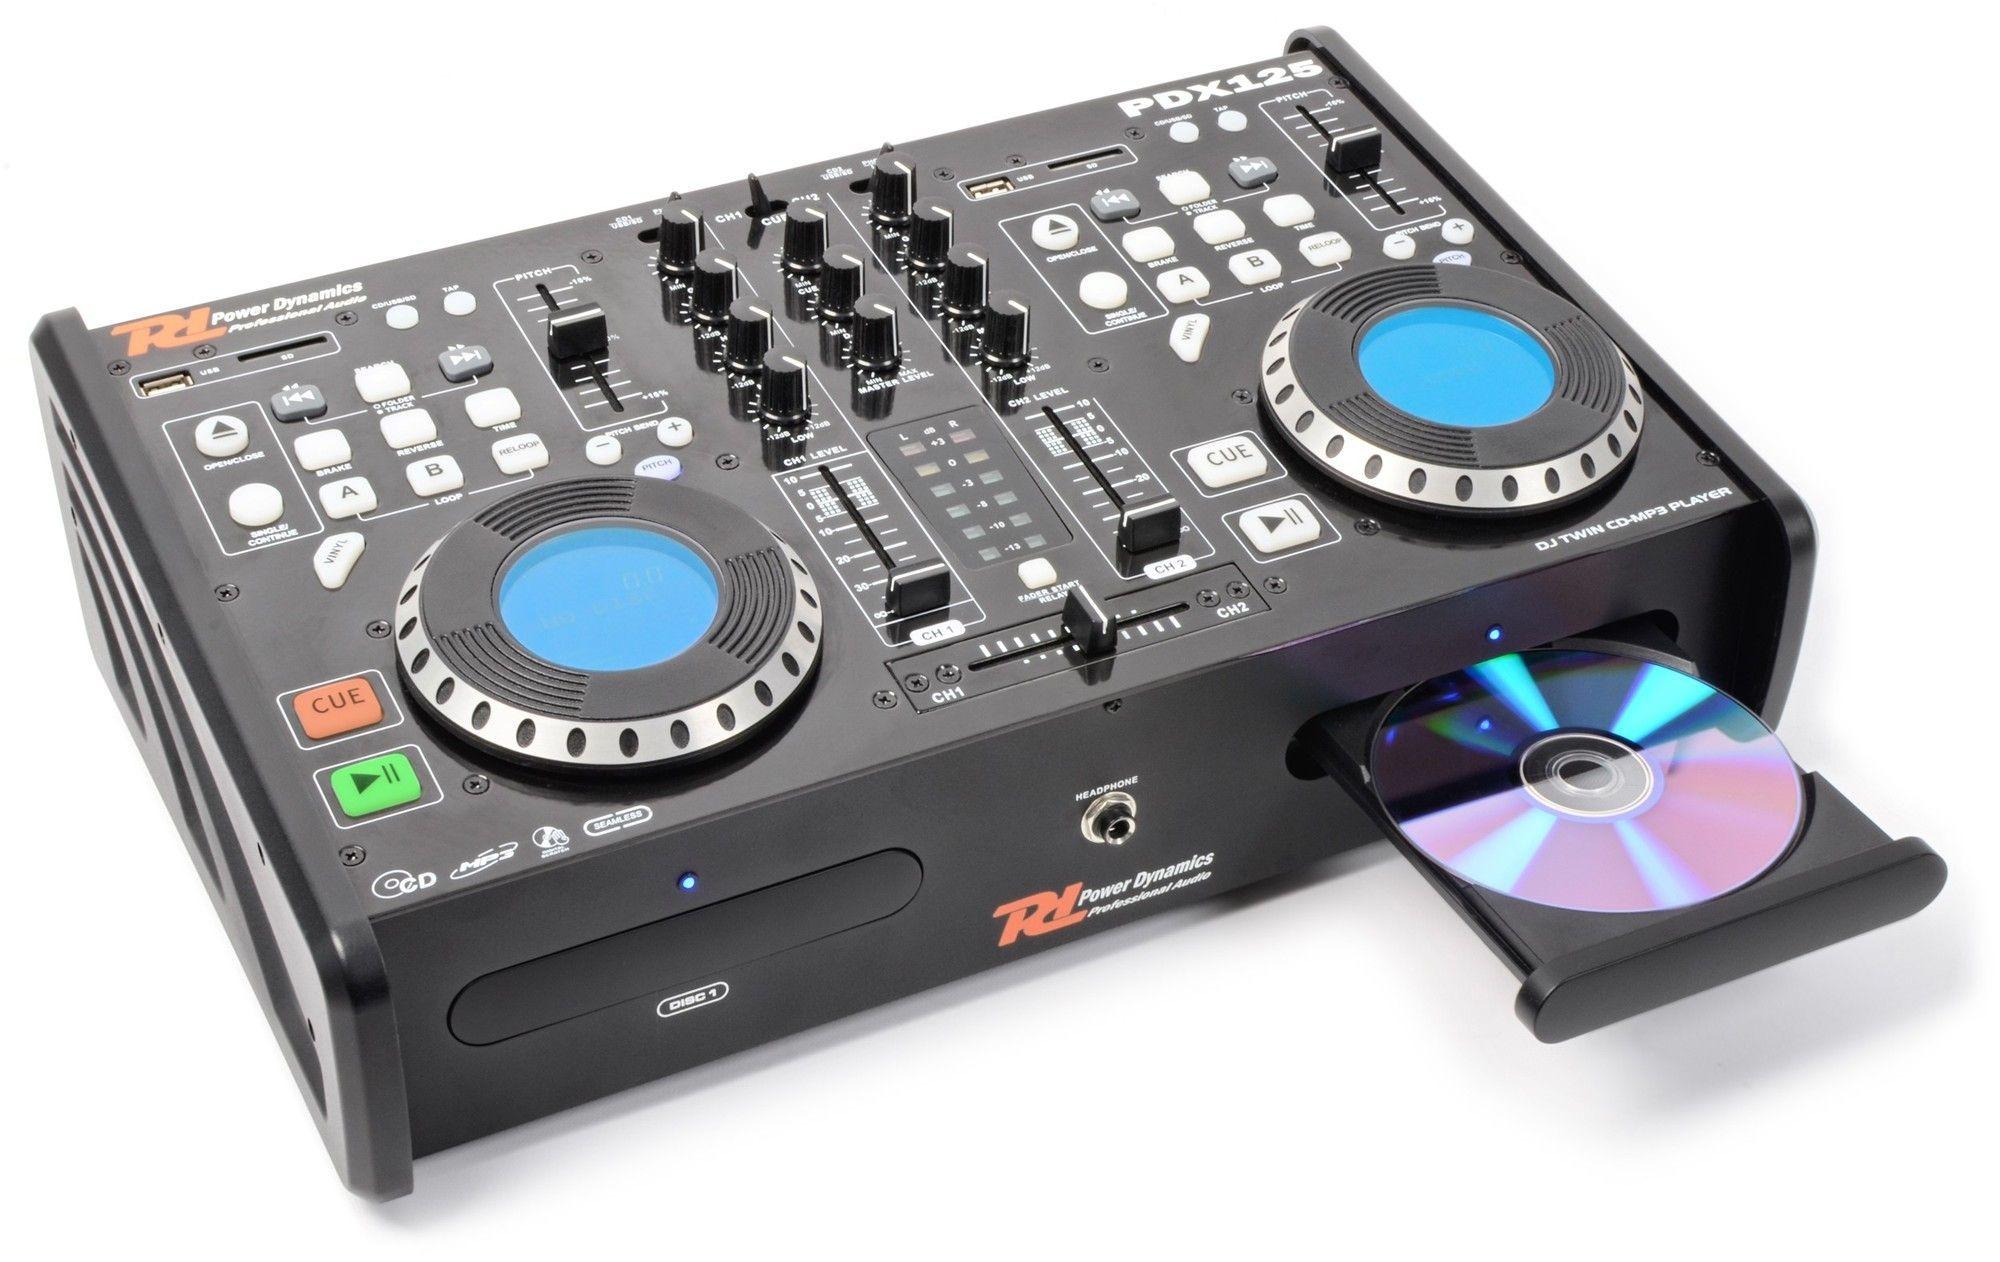 B-Stock - Power Dynamics PDX125 dubbele CD/USB/CD/MP3 speler en mixer